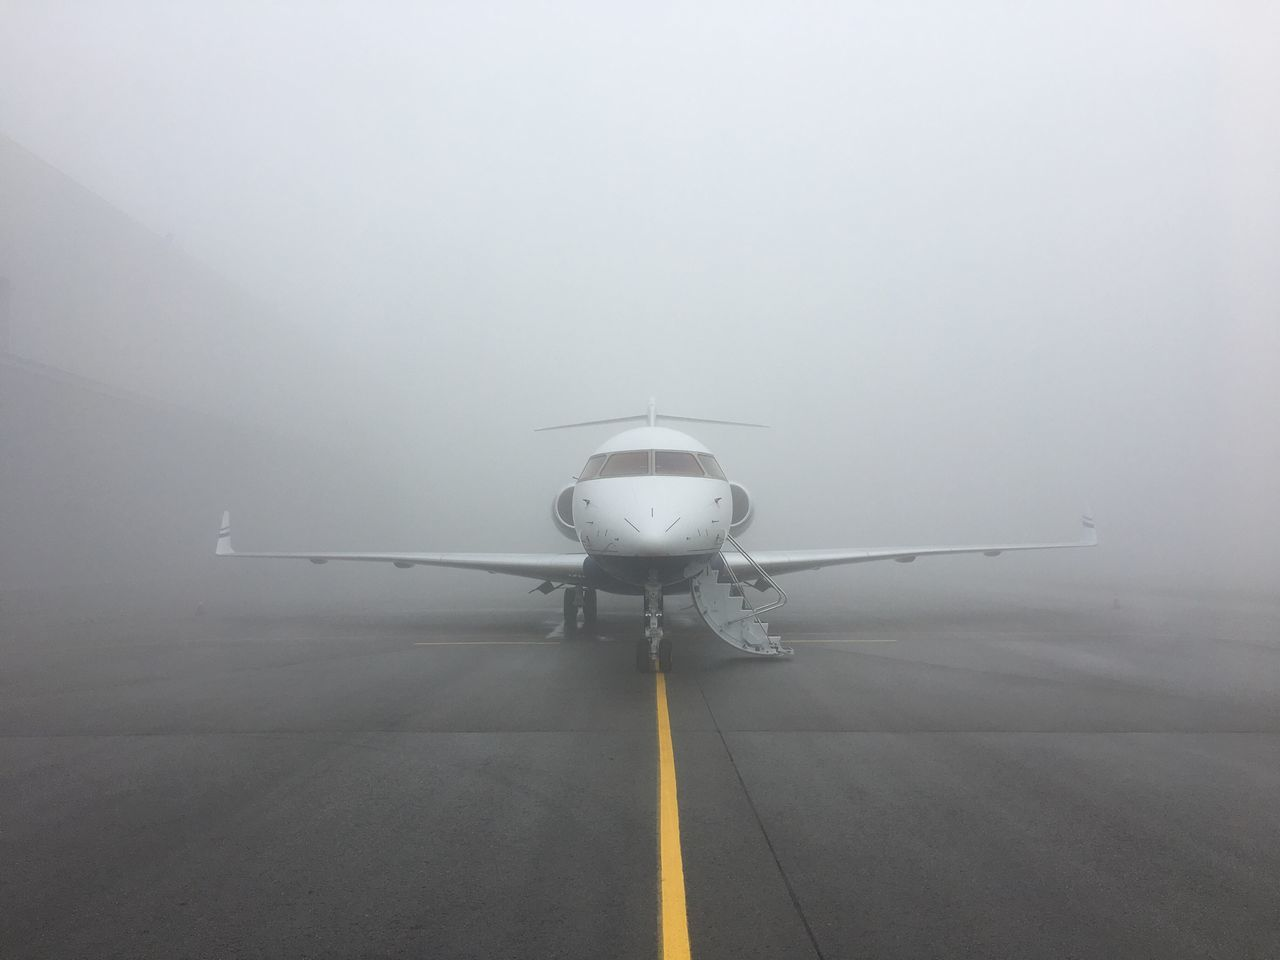 Airplane Transportation Air Vehicle Airport Airport Runway Runway No People Day Nature Outdoors Passenger Boarding Bridge Fog